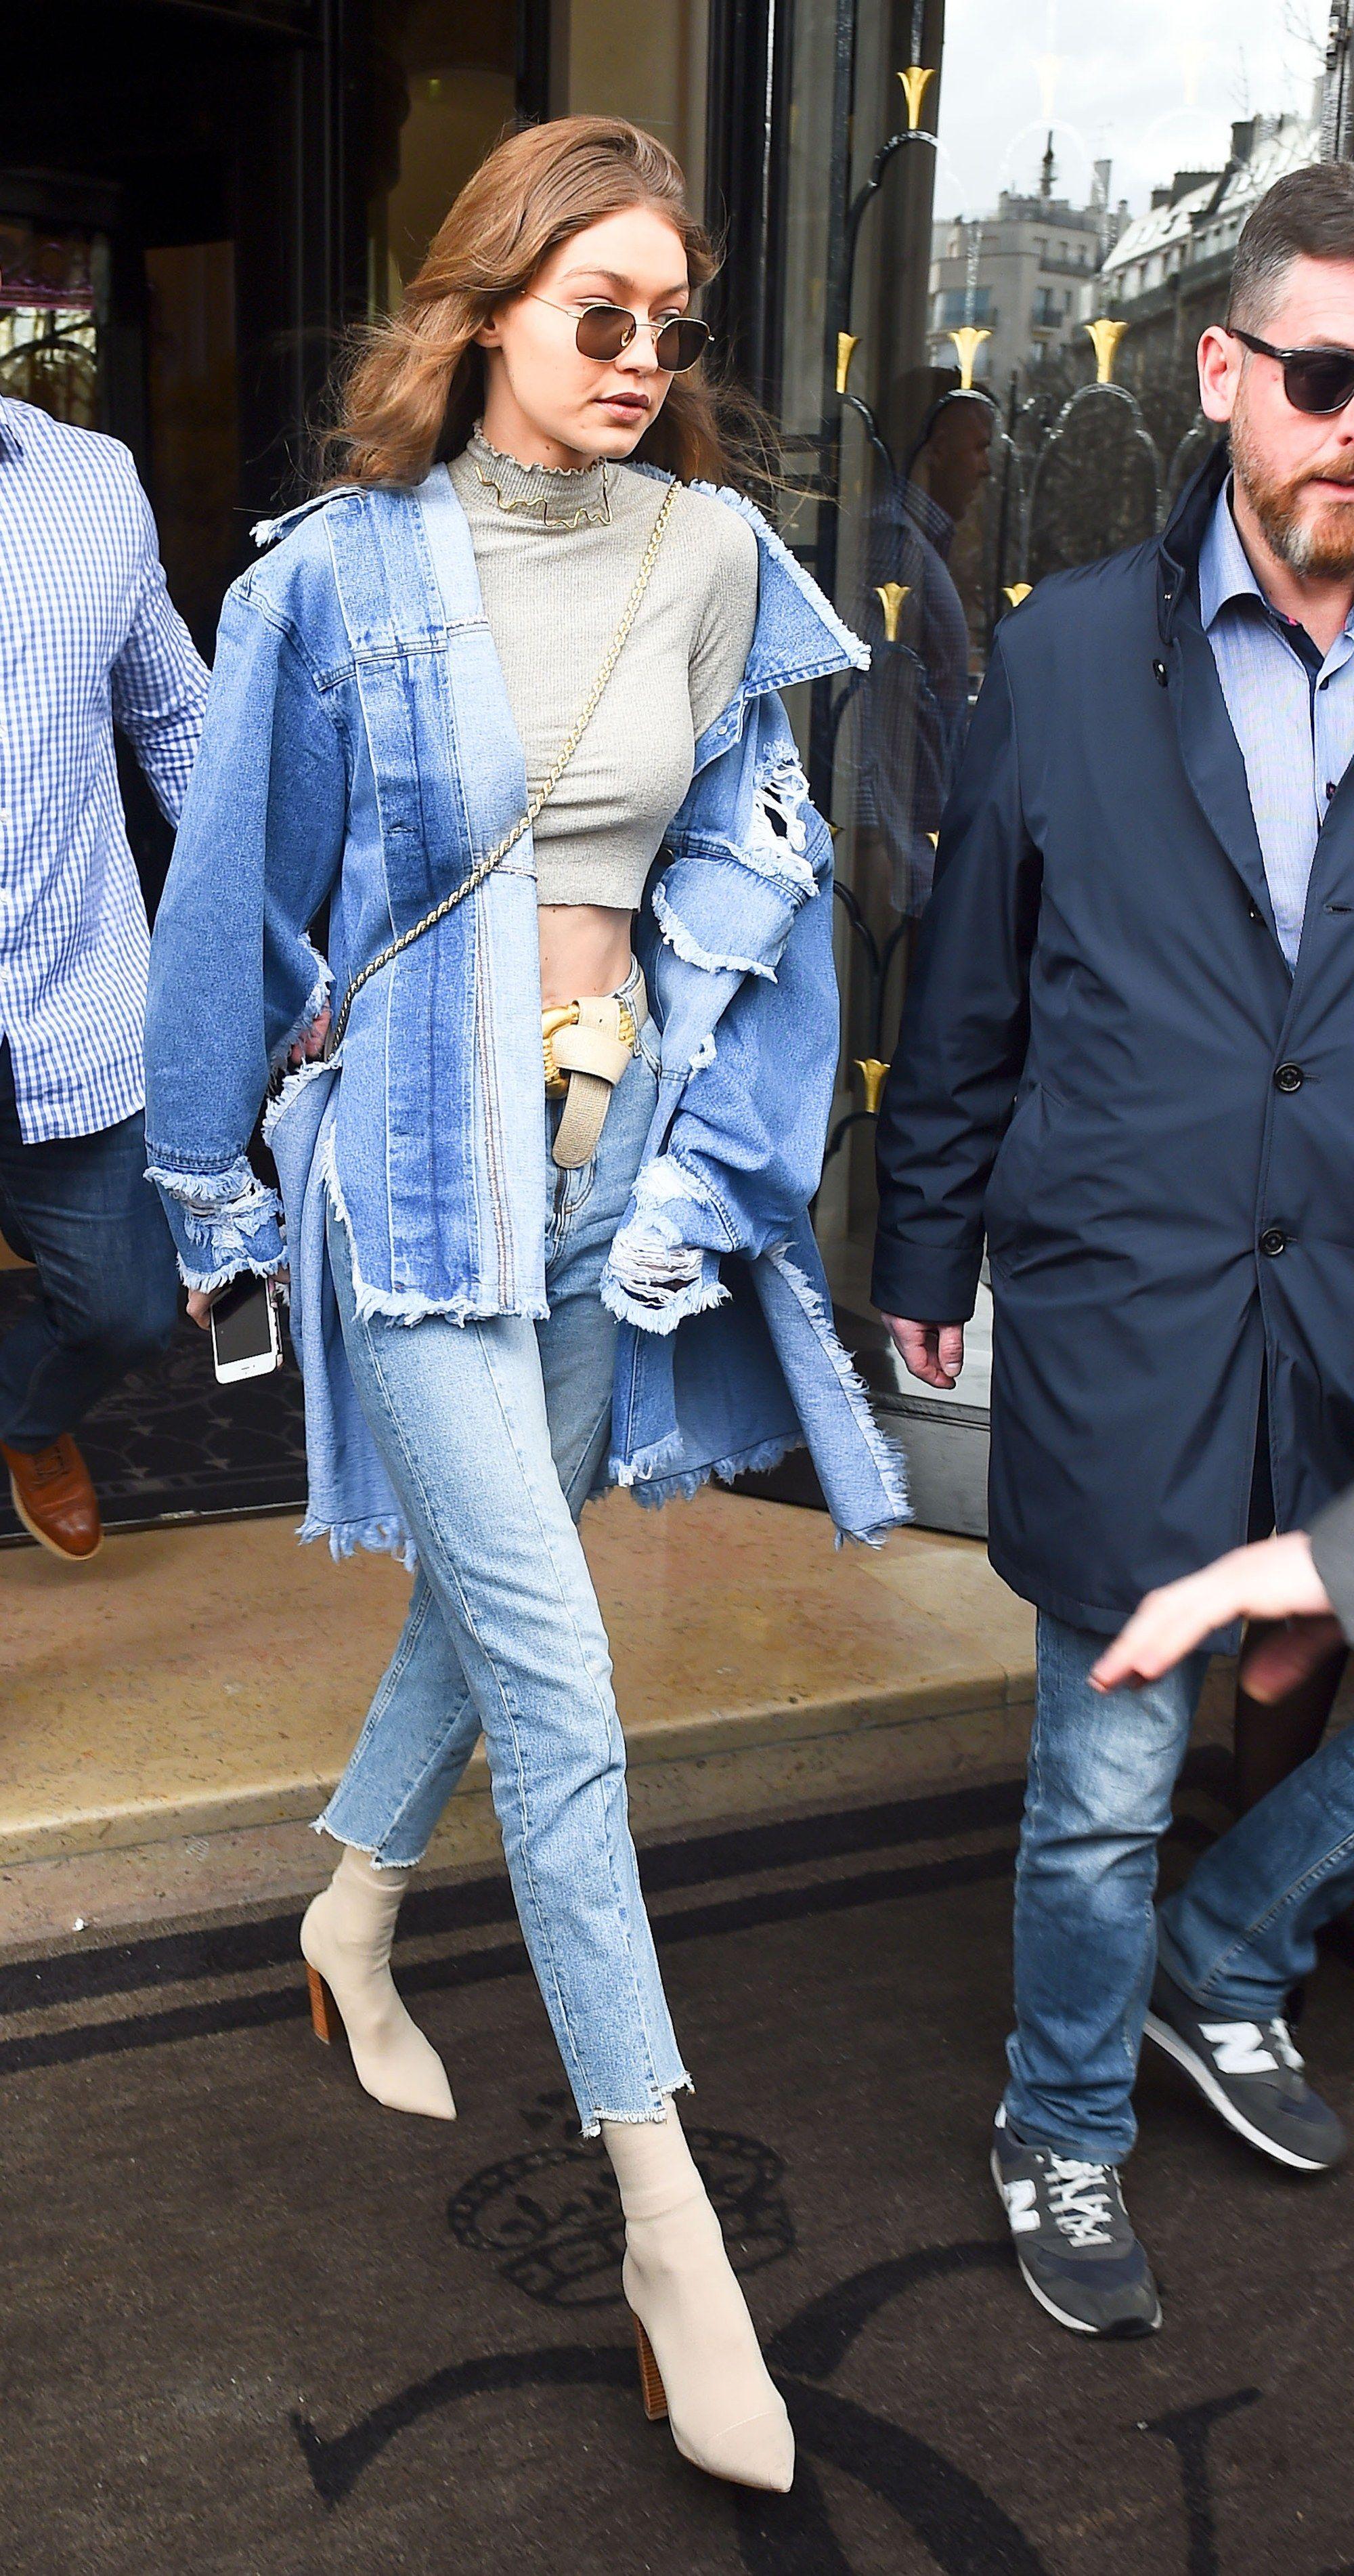 CelebGate Mila Kunis picture